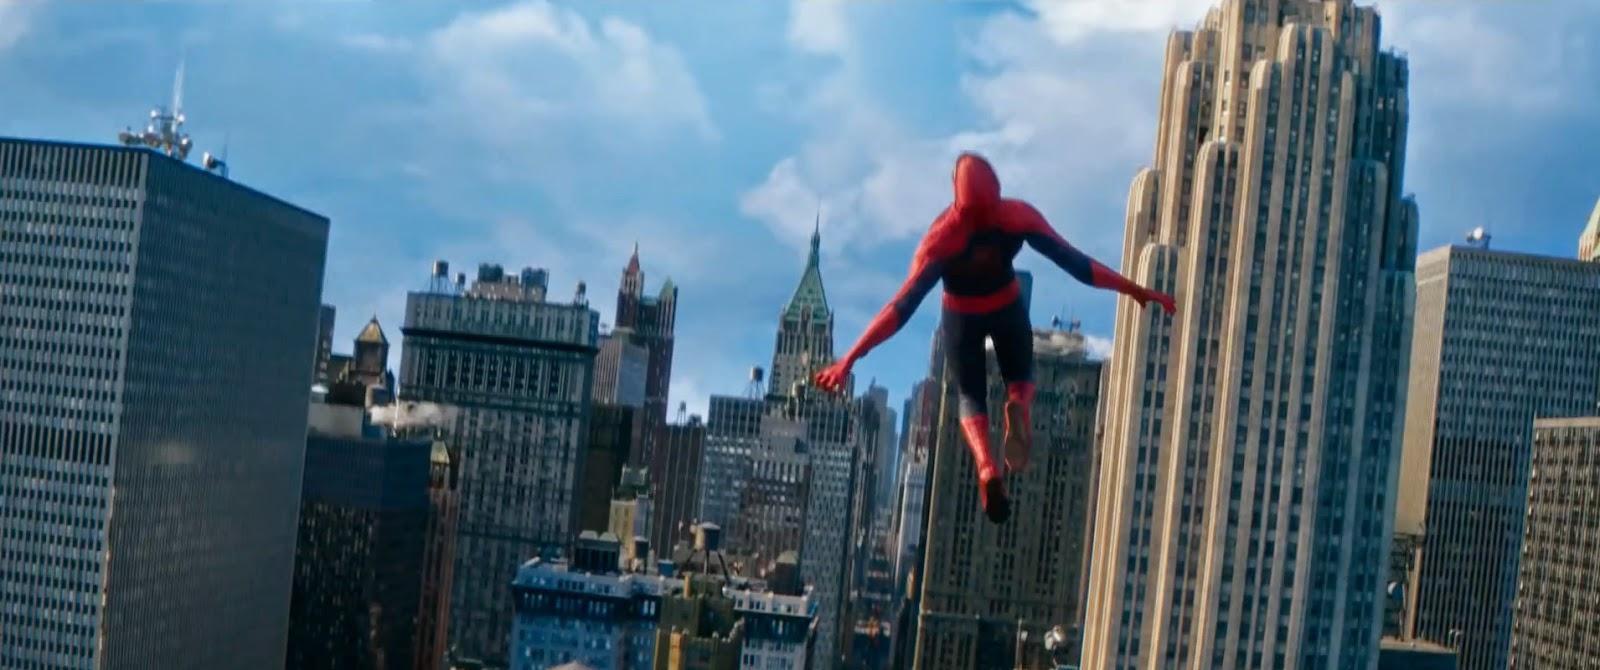 Spiderman Background Buildings